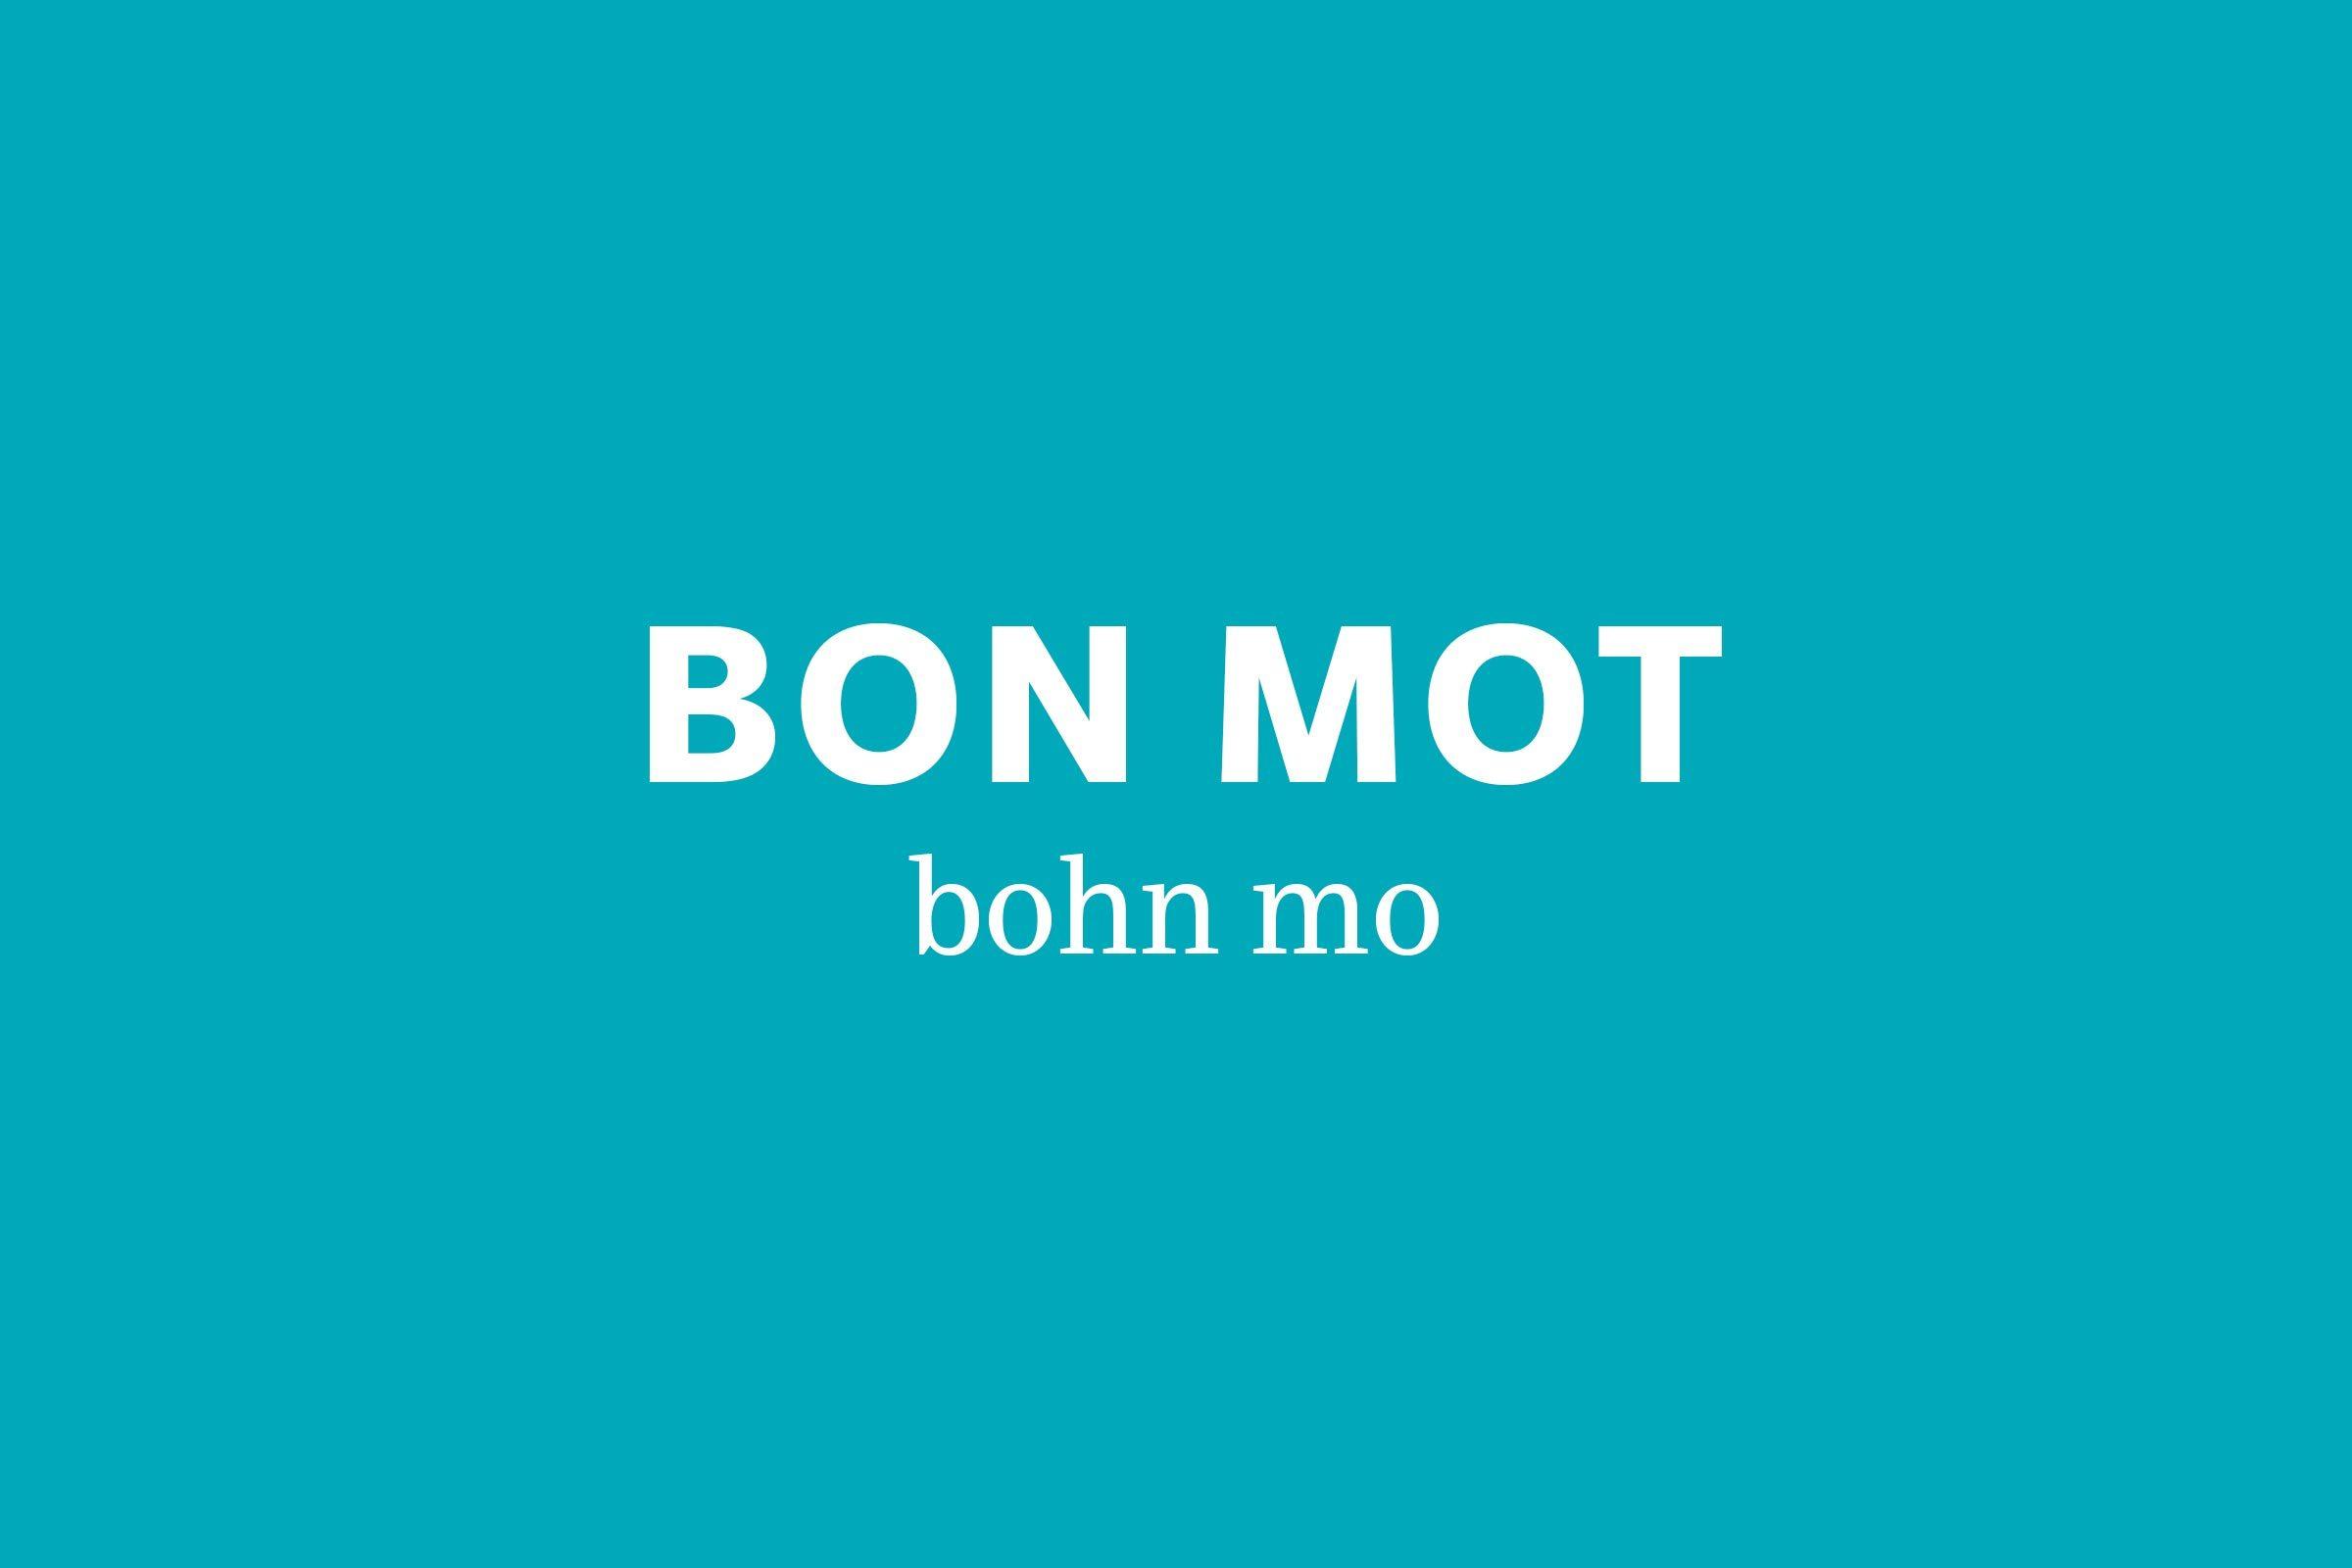 bon mot pronunciation